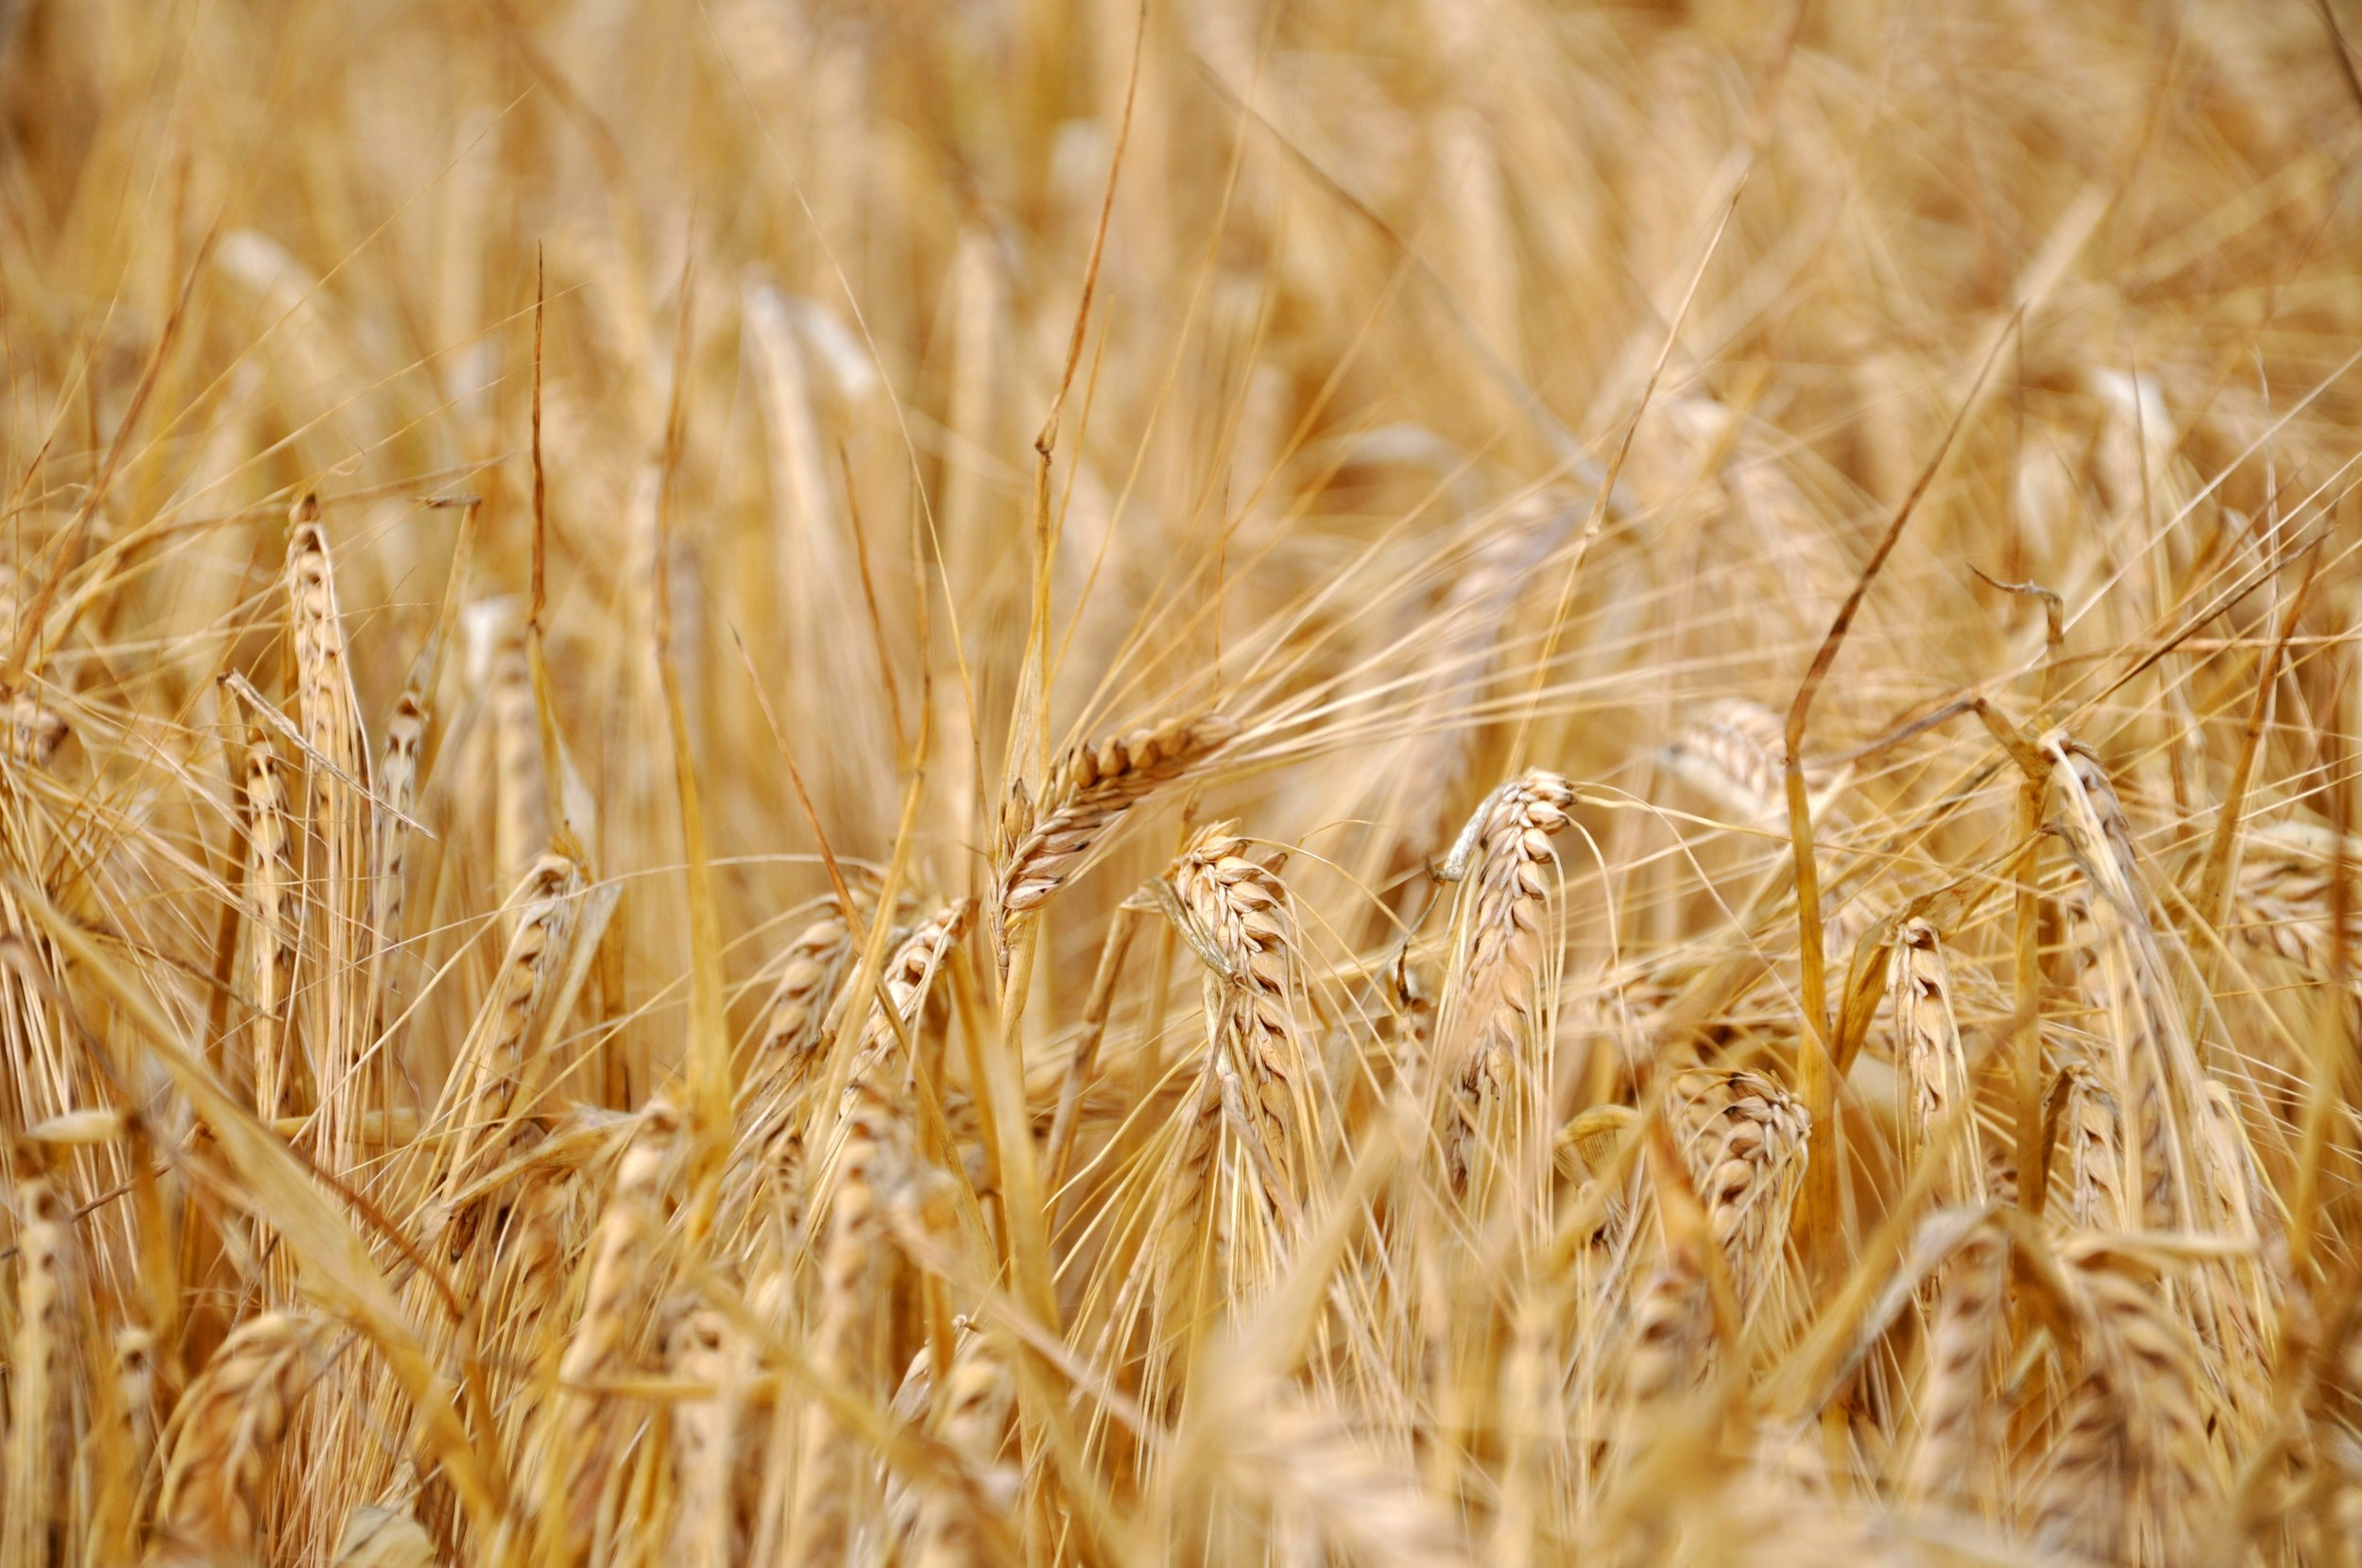 Cereal rye, barley, maize, oats, sorghum, wheat, triticale